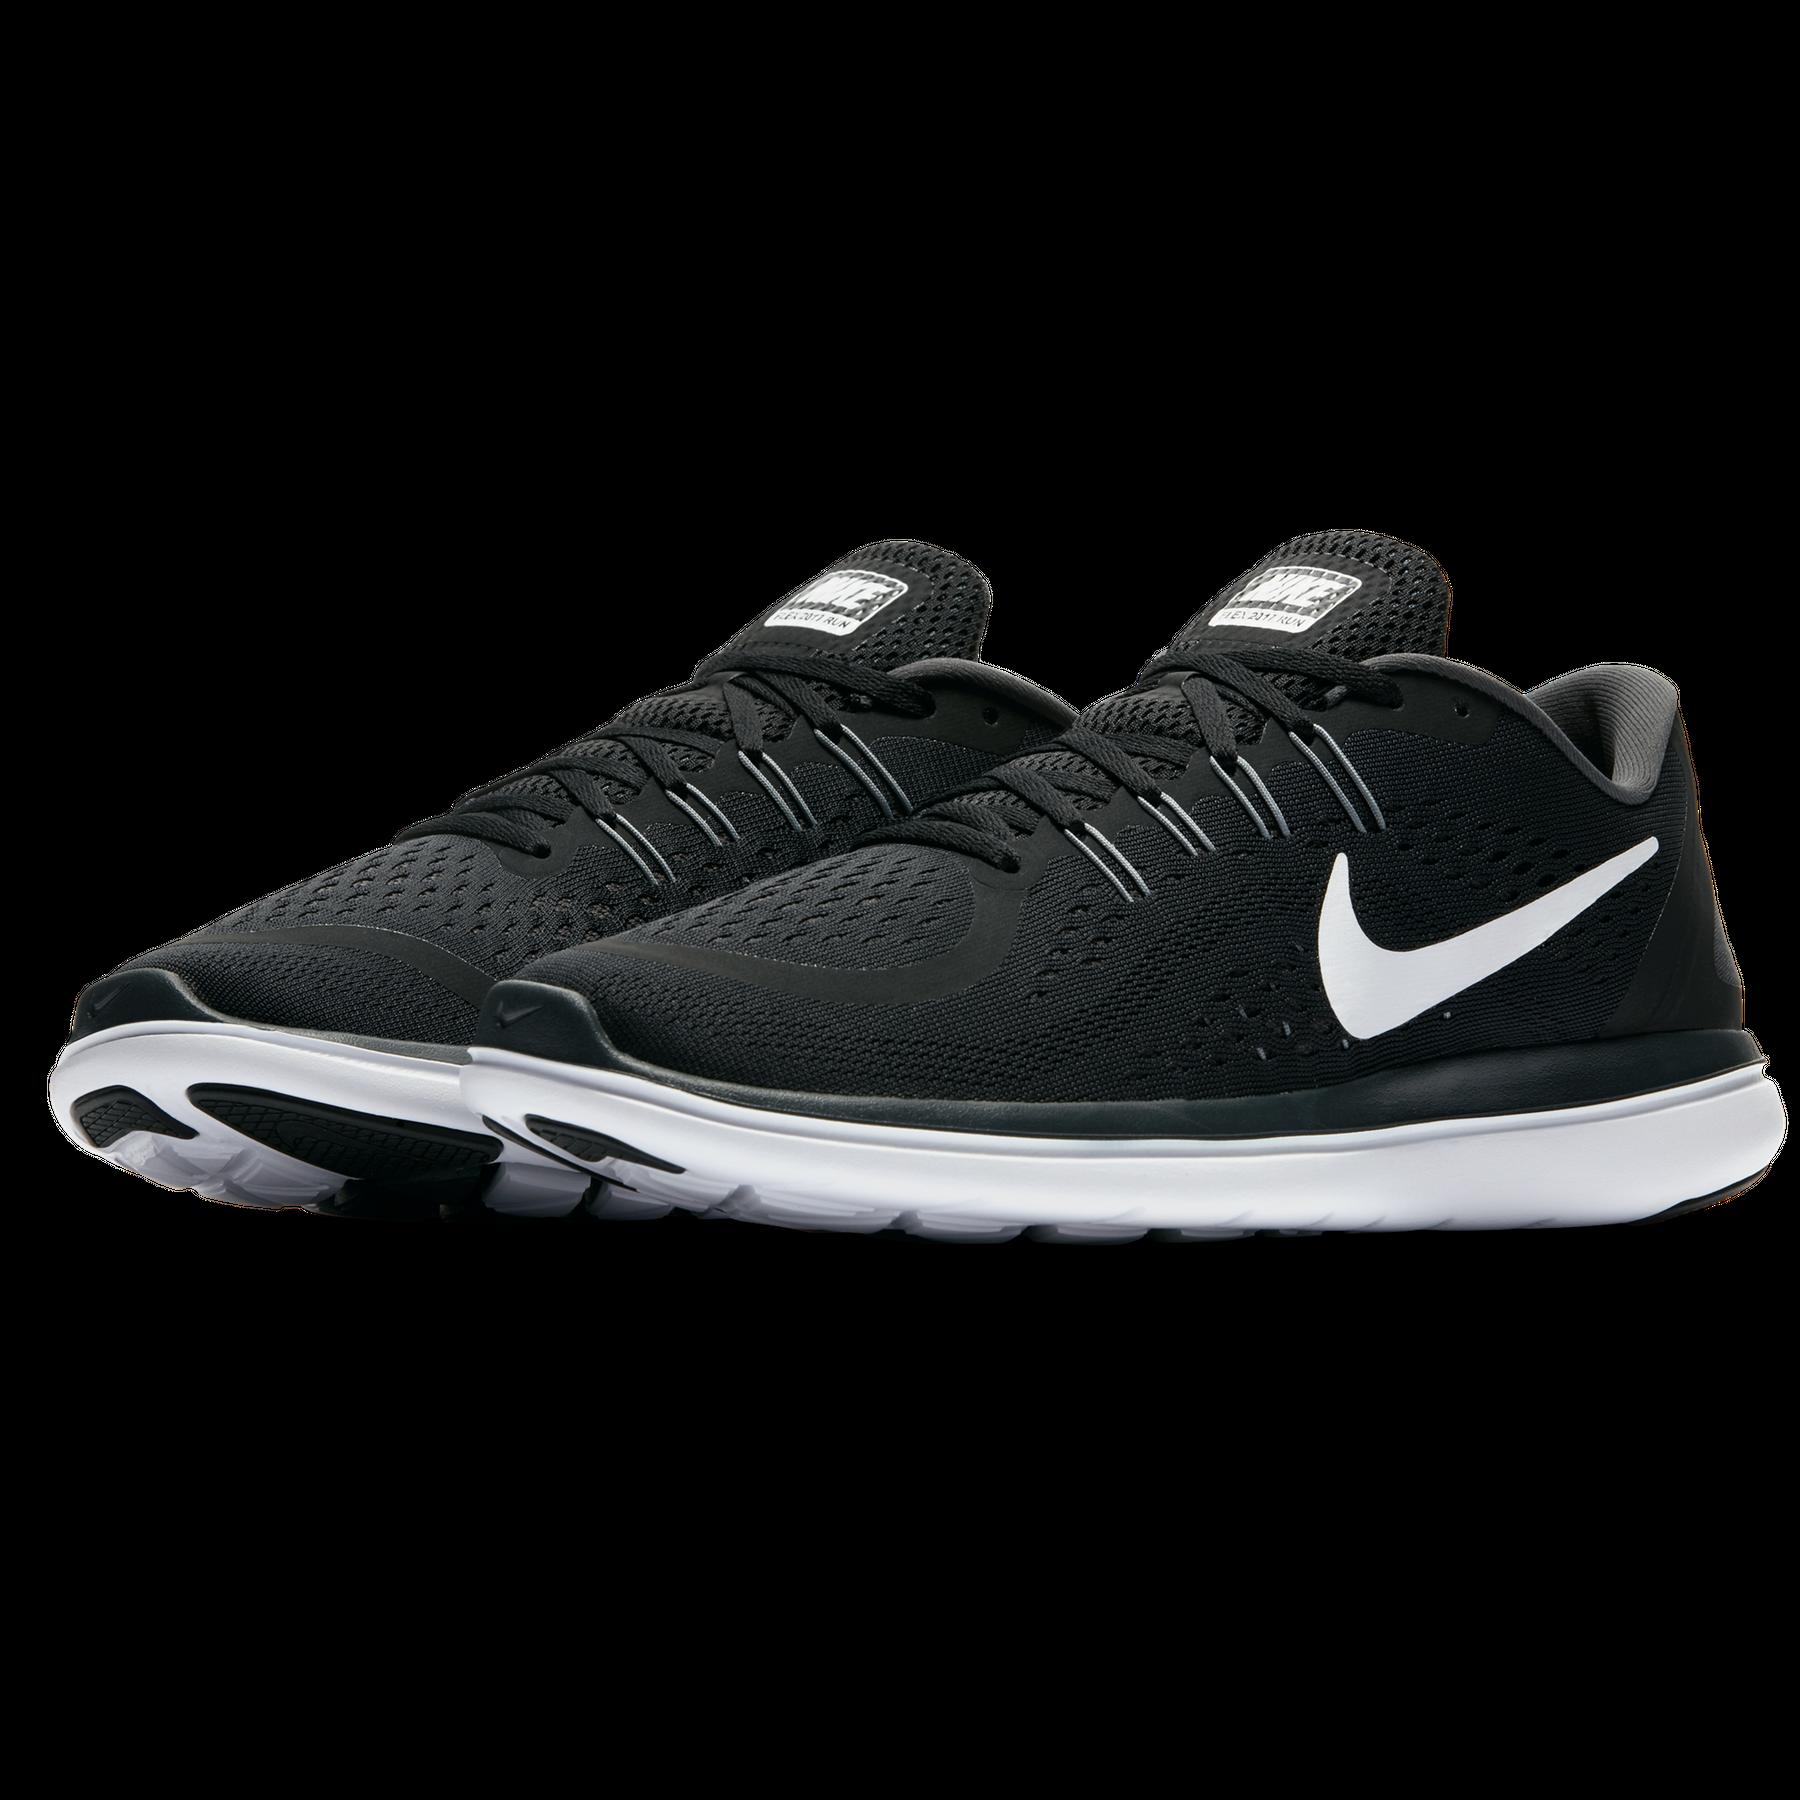 Details zu Nike Flex 2017 RN schwarz weiß Herren Trainingsschuhe Sportschuhe Sneaker NEU